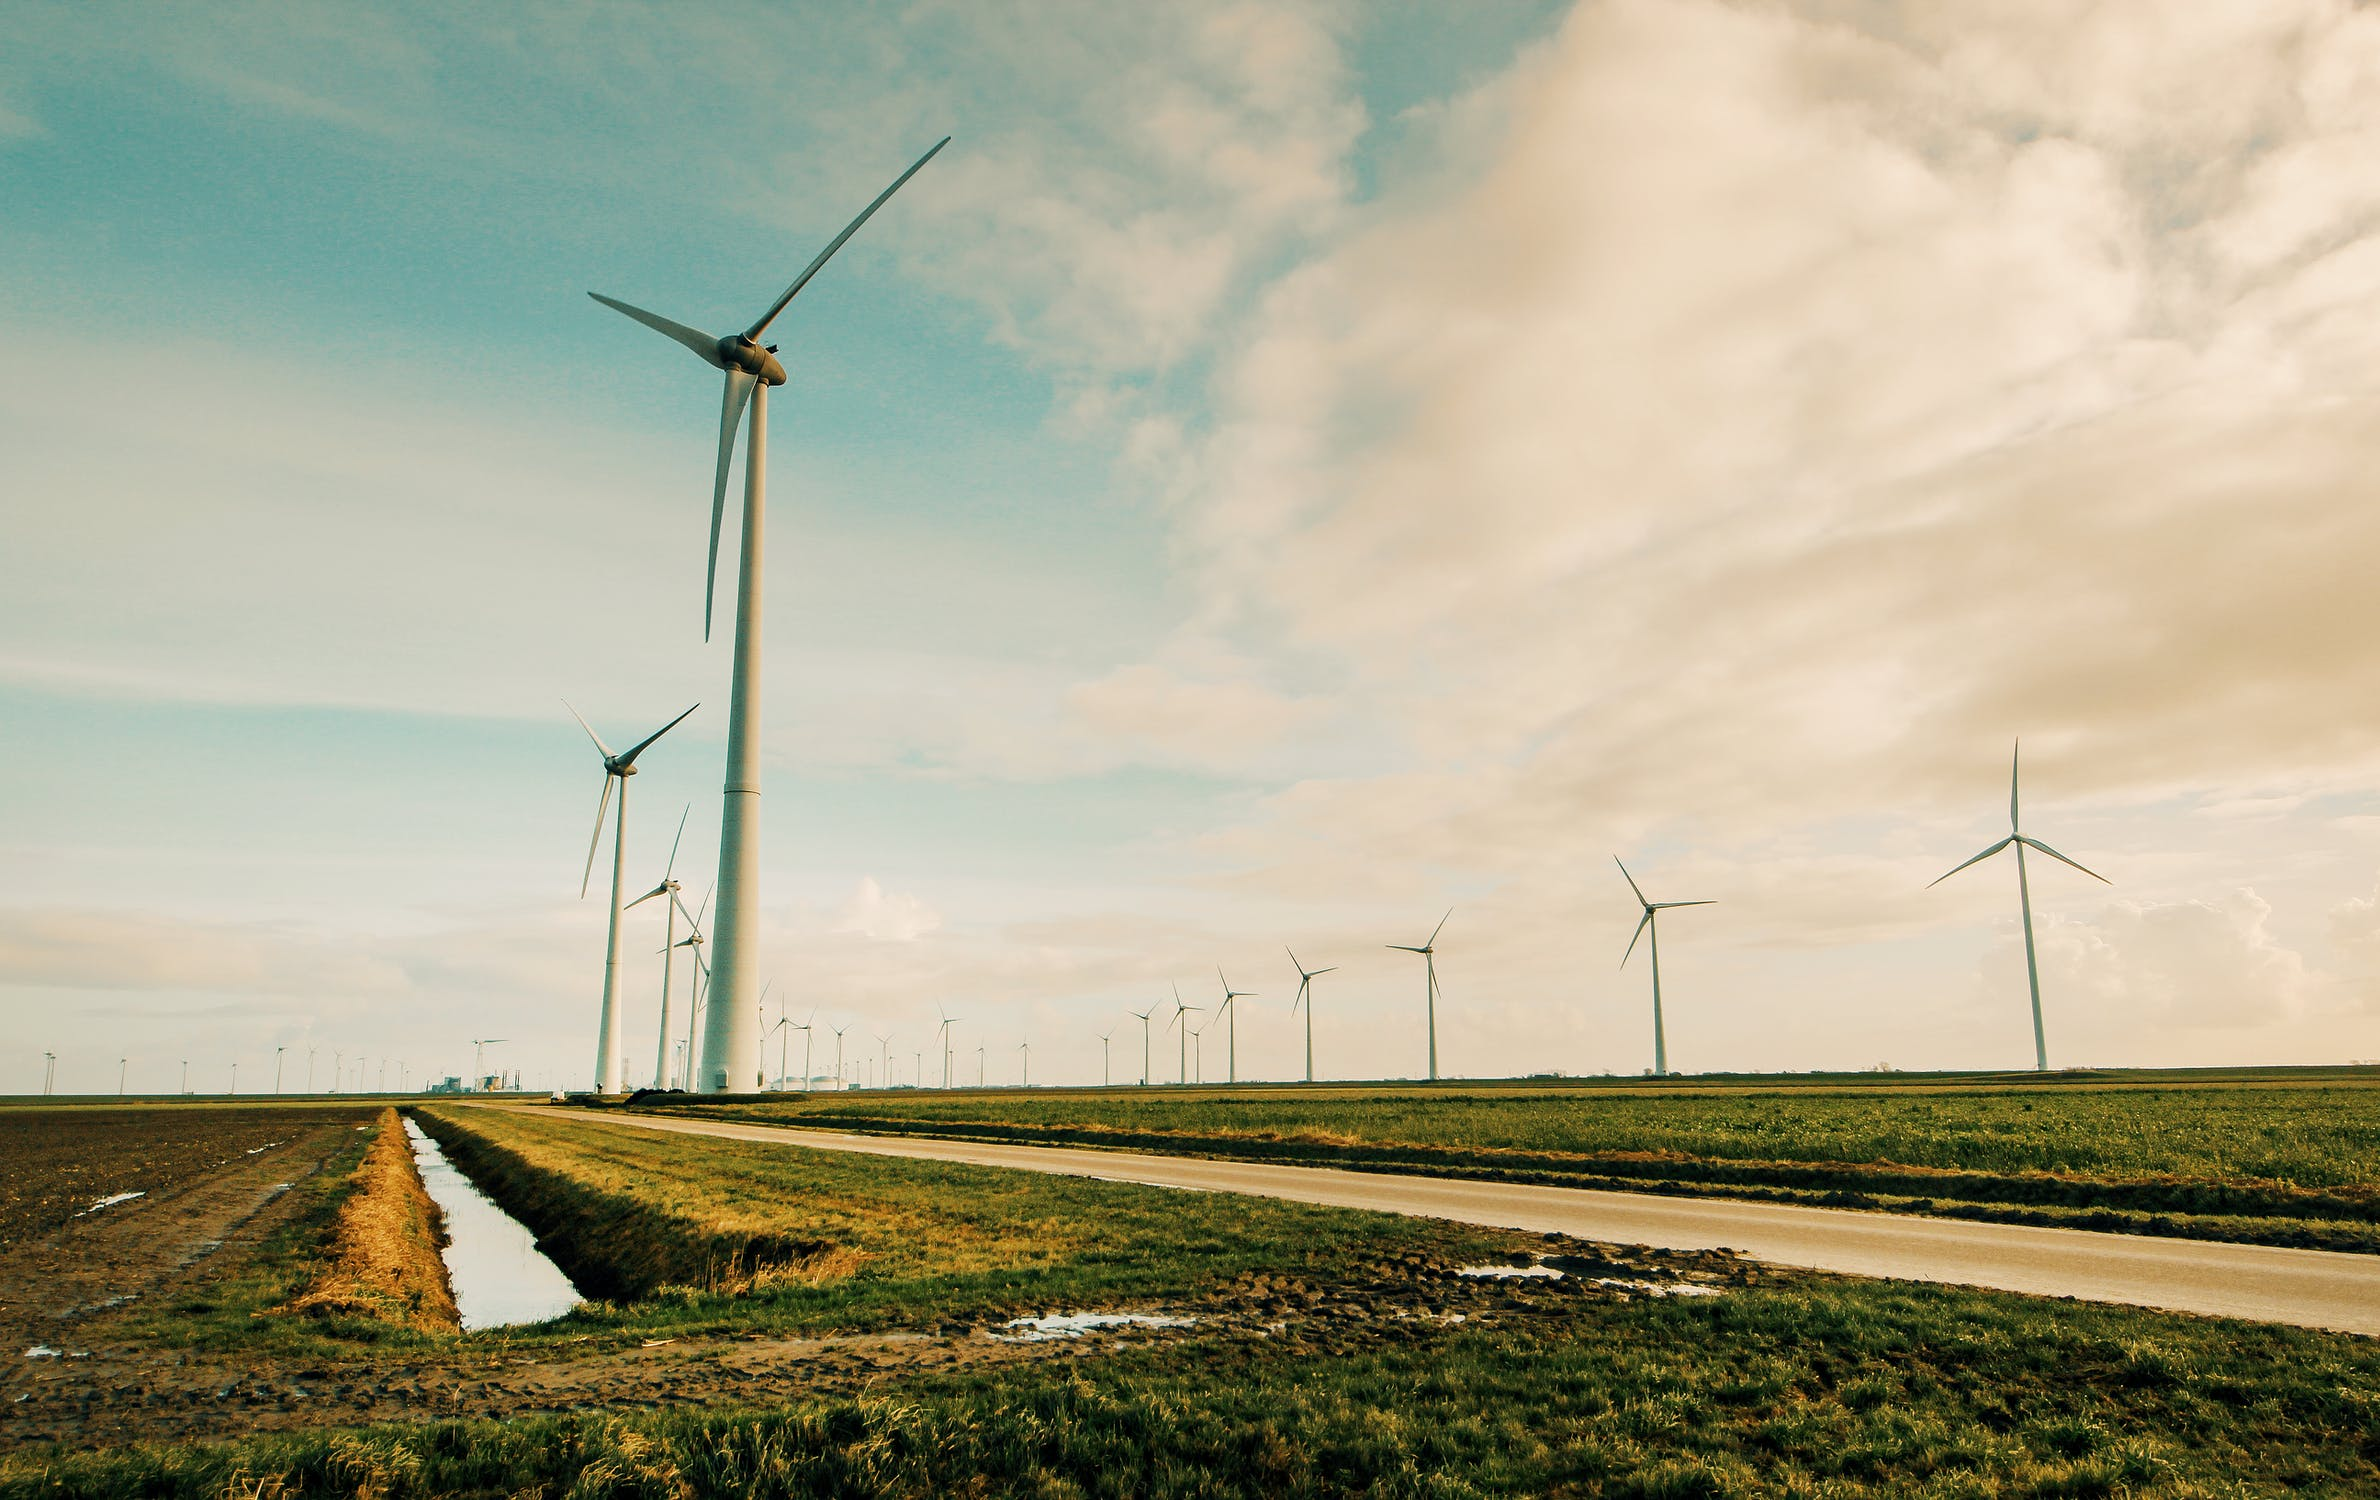 AleaSoft - Wind power park renewable energy